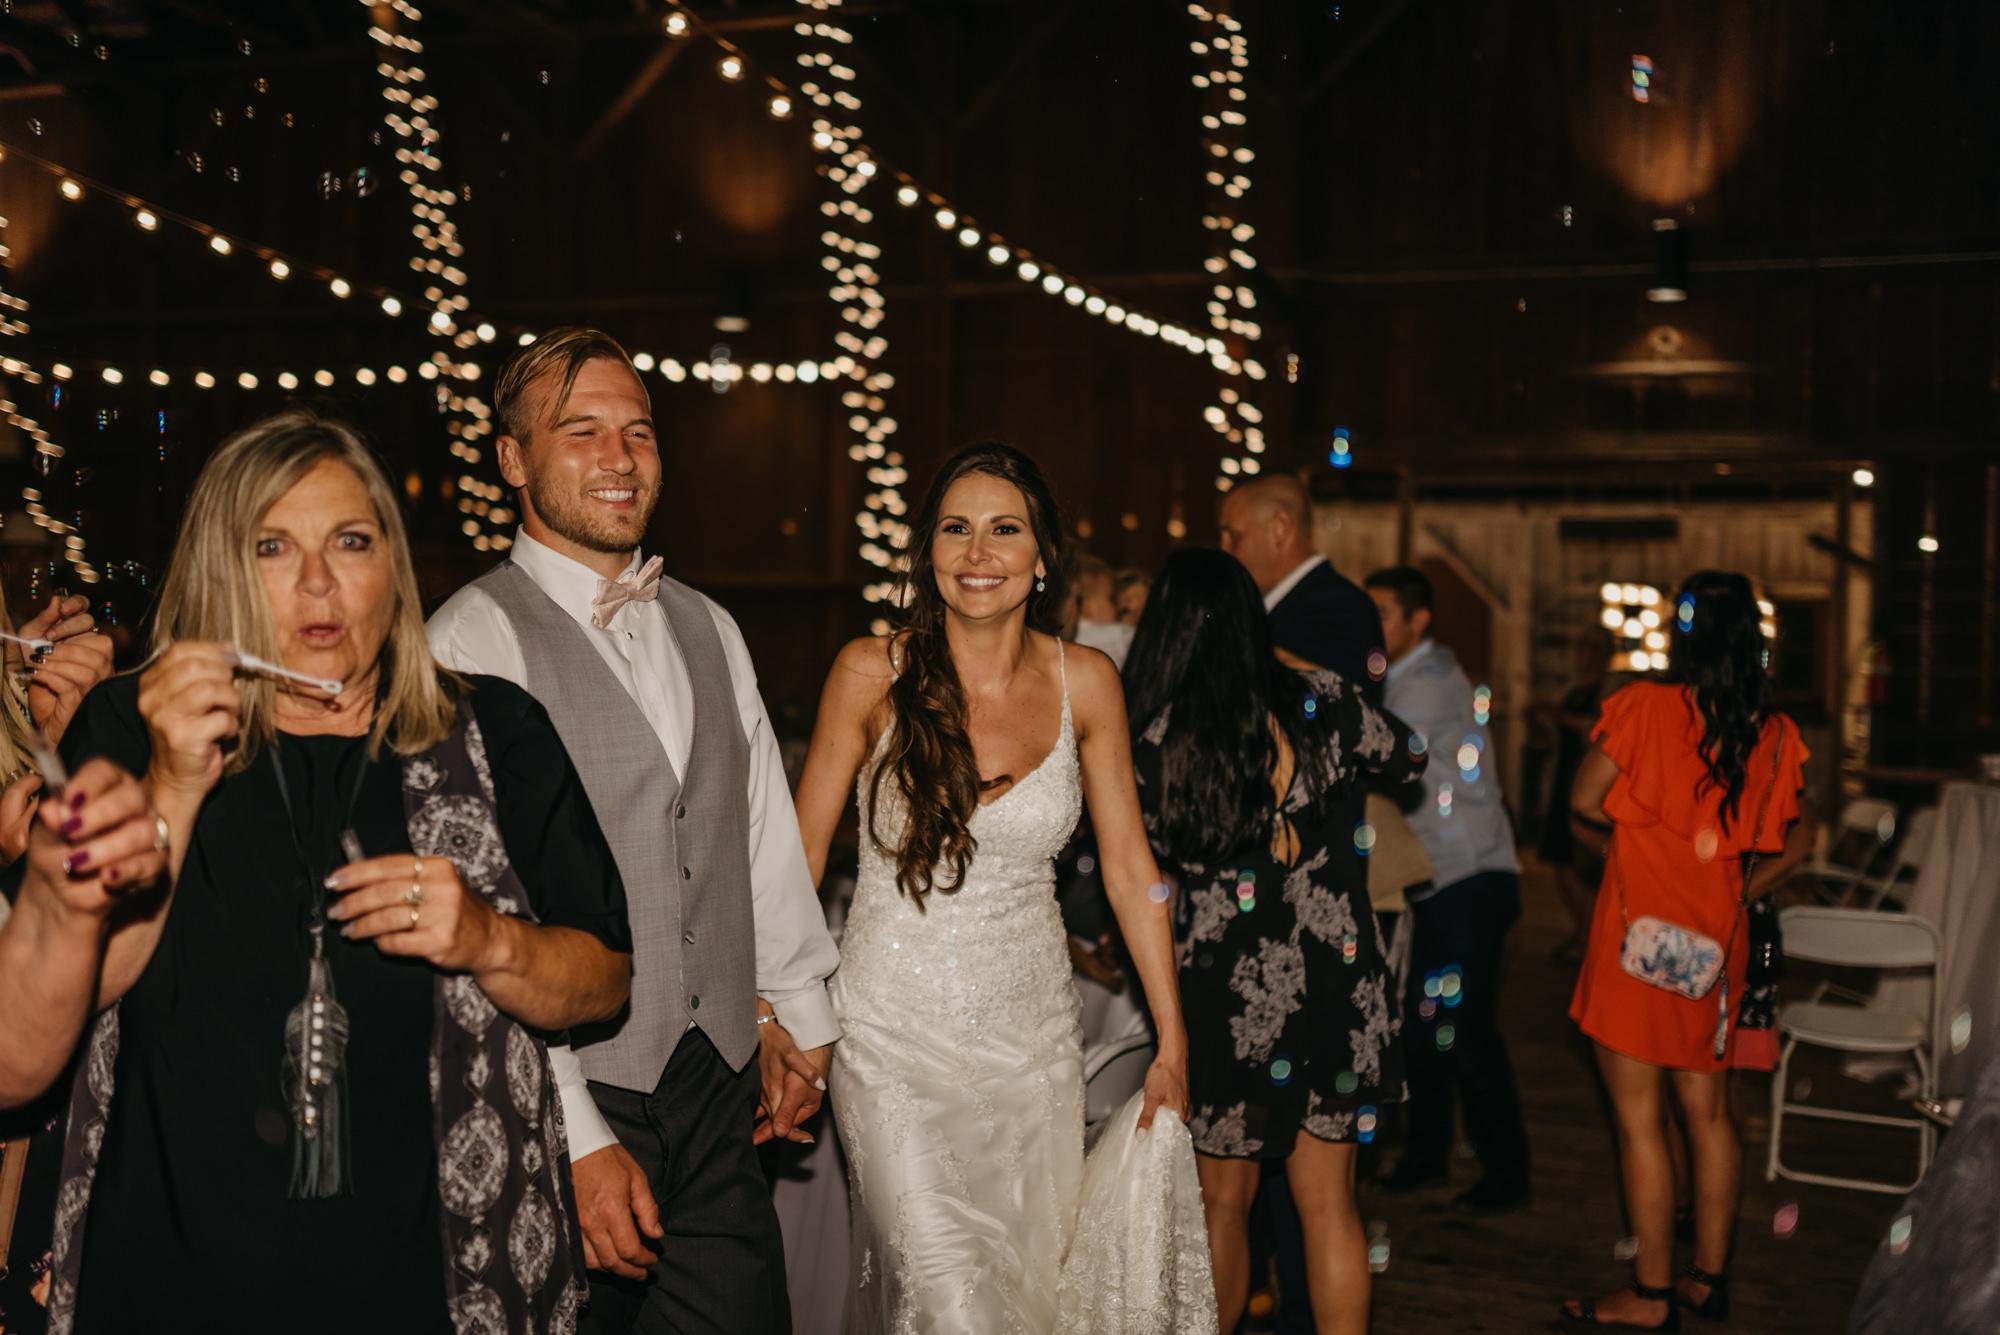 221-portland-northwest-wedding-bubble-exit-barn-string-lights.jpg